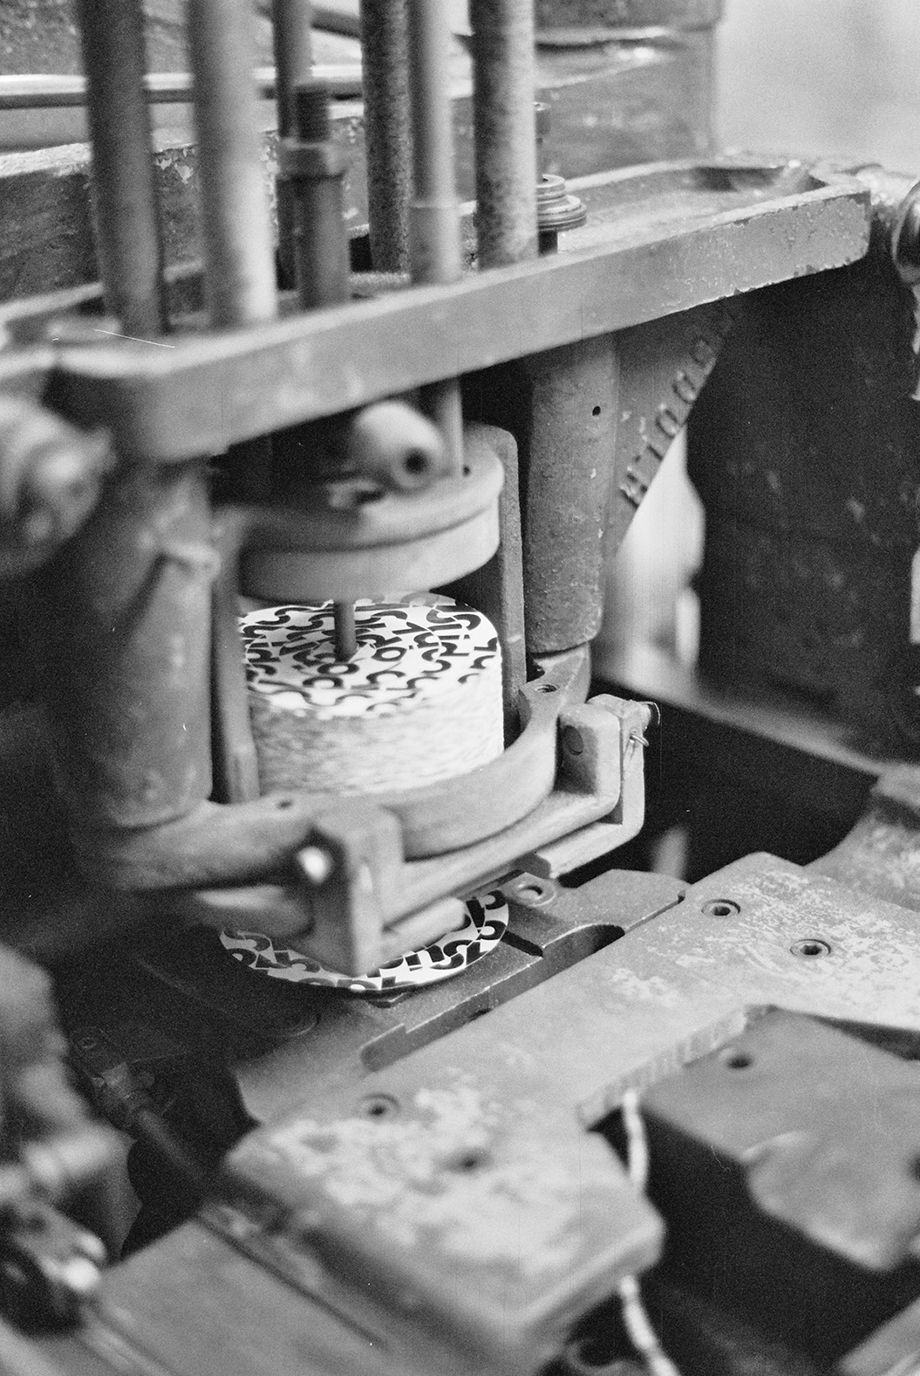 Labels loaded ready to press vinyl-pressing-plants com